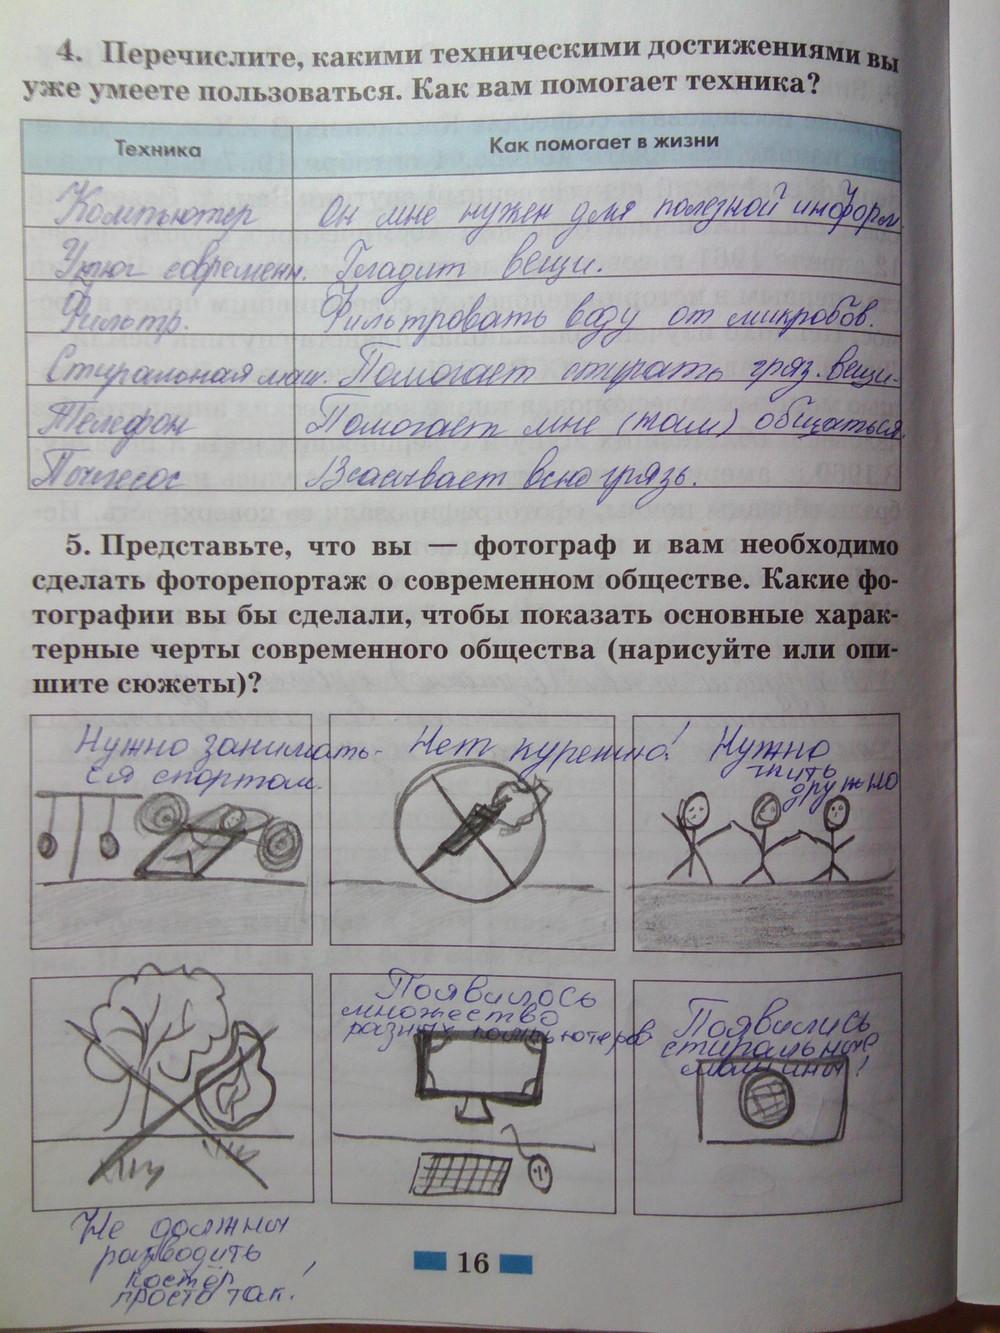 Обществу рабочая по а. кравченко тетрадь гдз